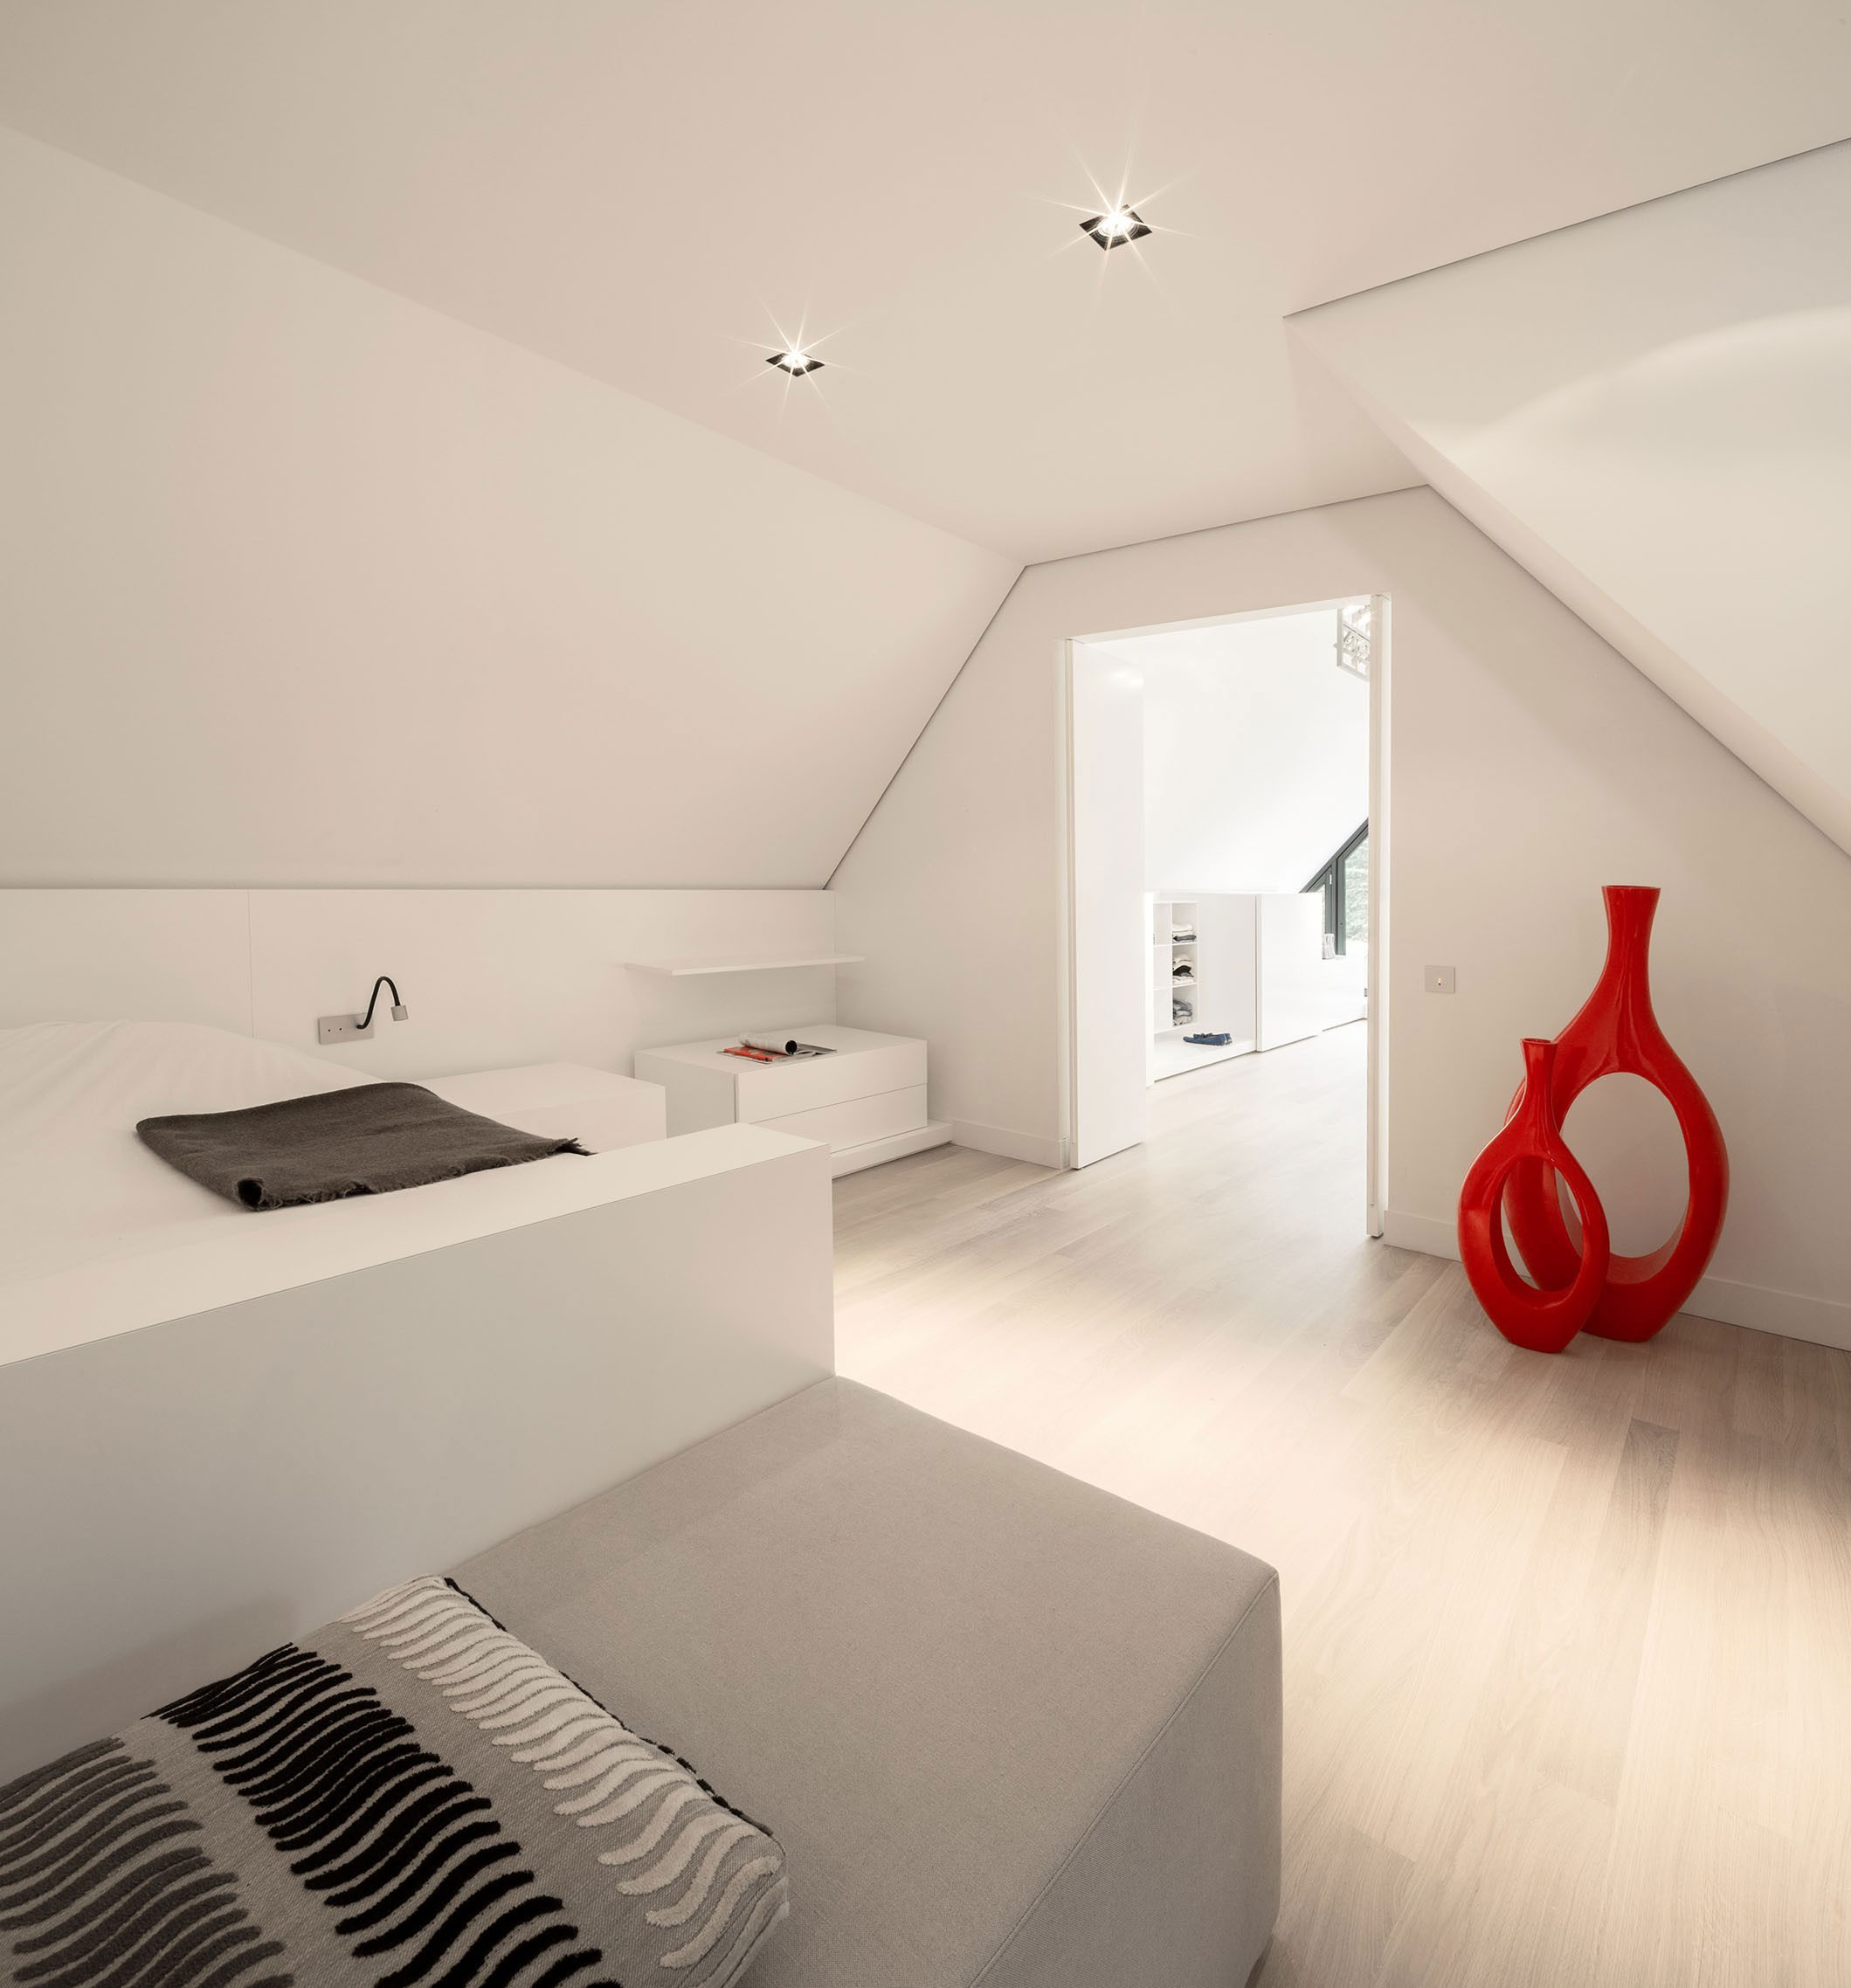 Modern Huizen Country House Located in a Quiet Rural Setting by De Brouwer Binnenwerk-16